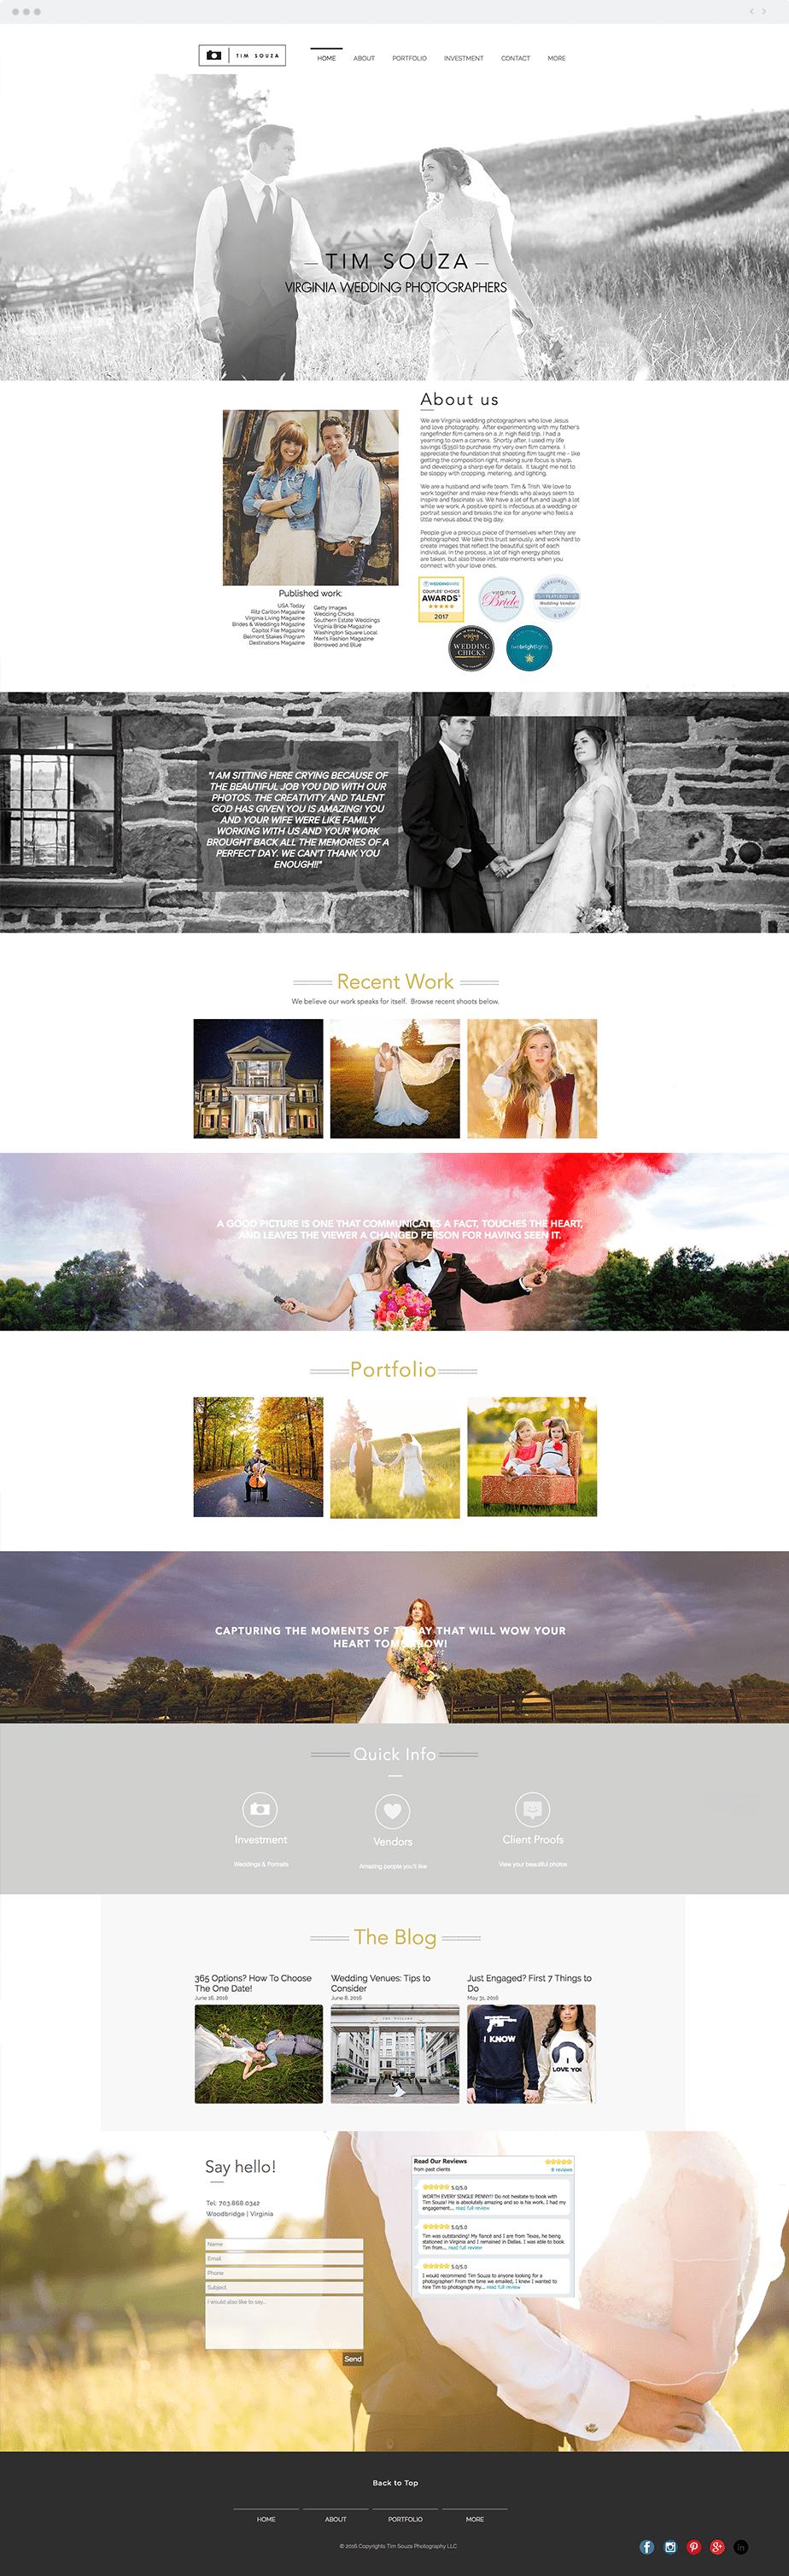 Amazing Wix online portfolio by wedding photographer Tim Souza